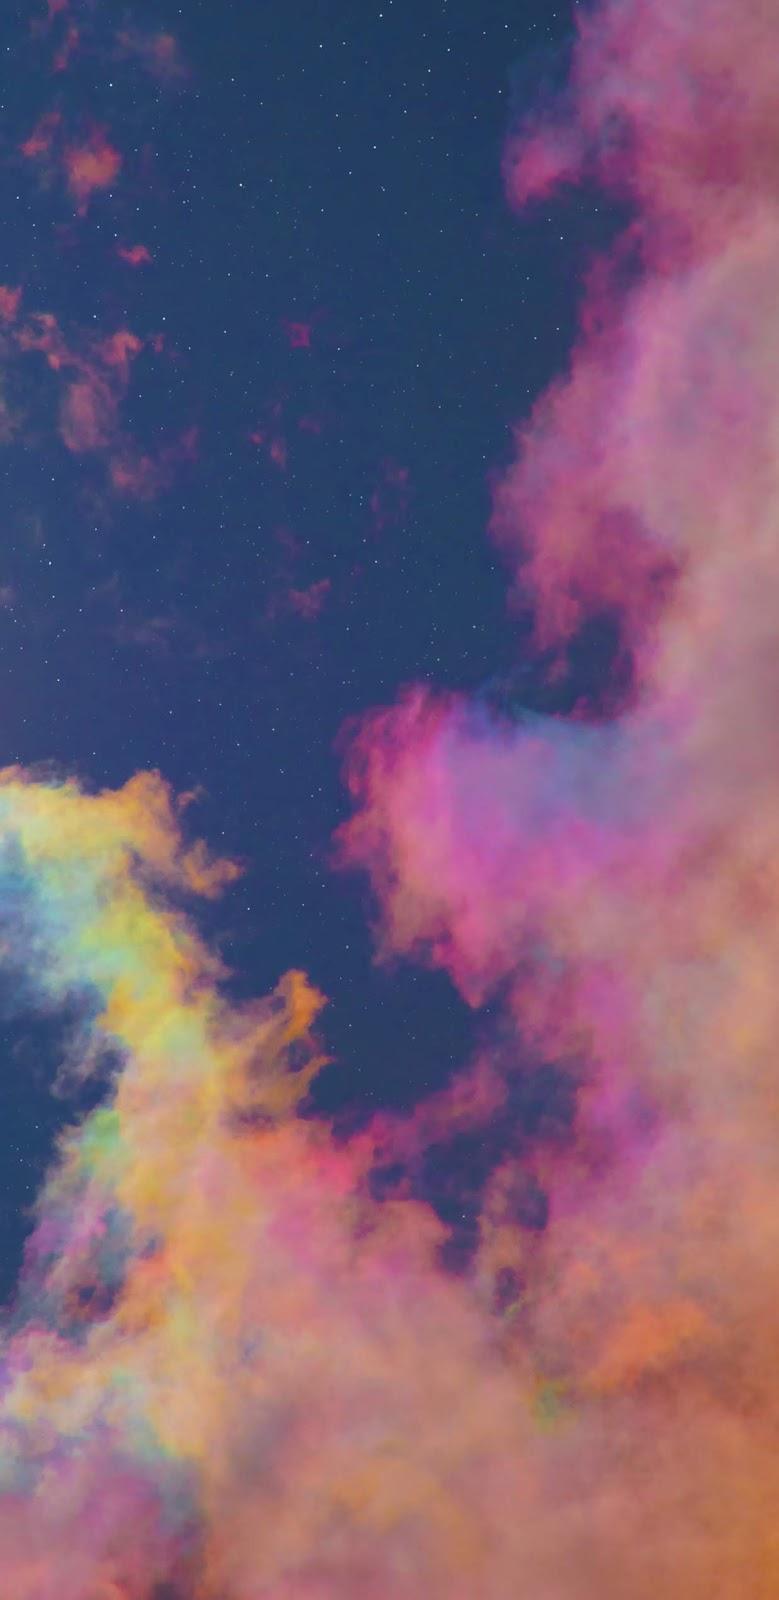 Colorful night sky wallpaper